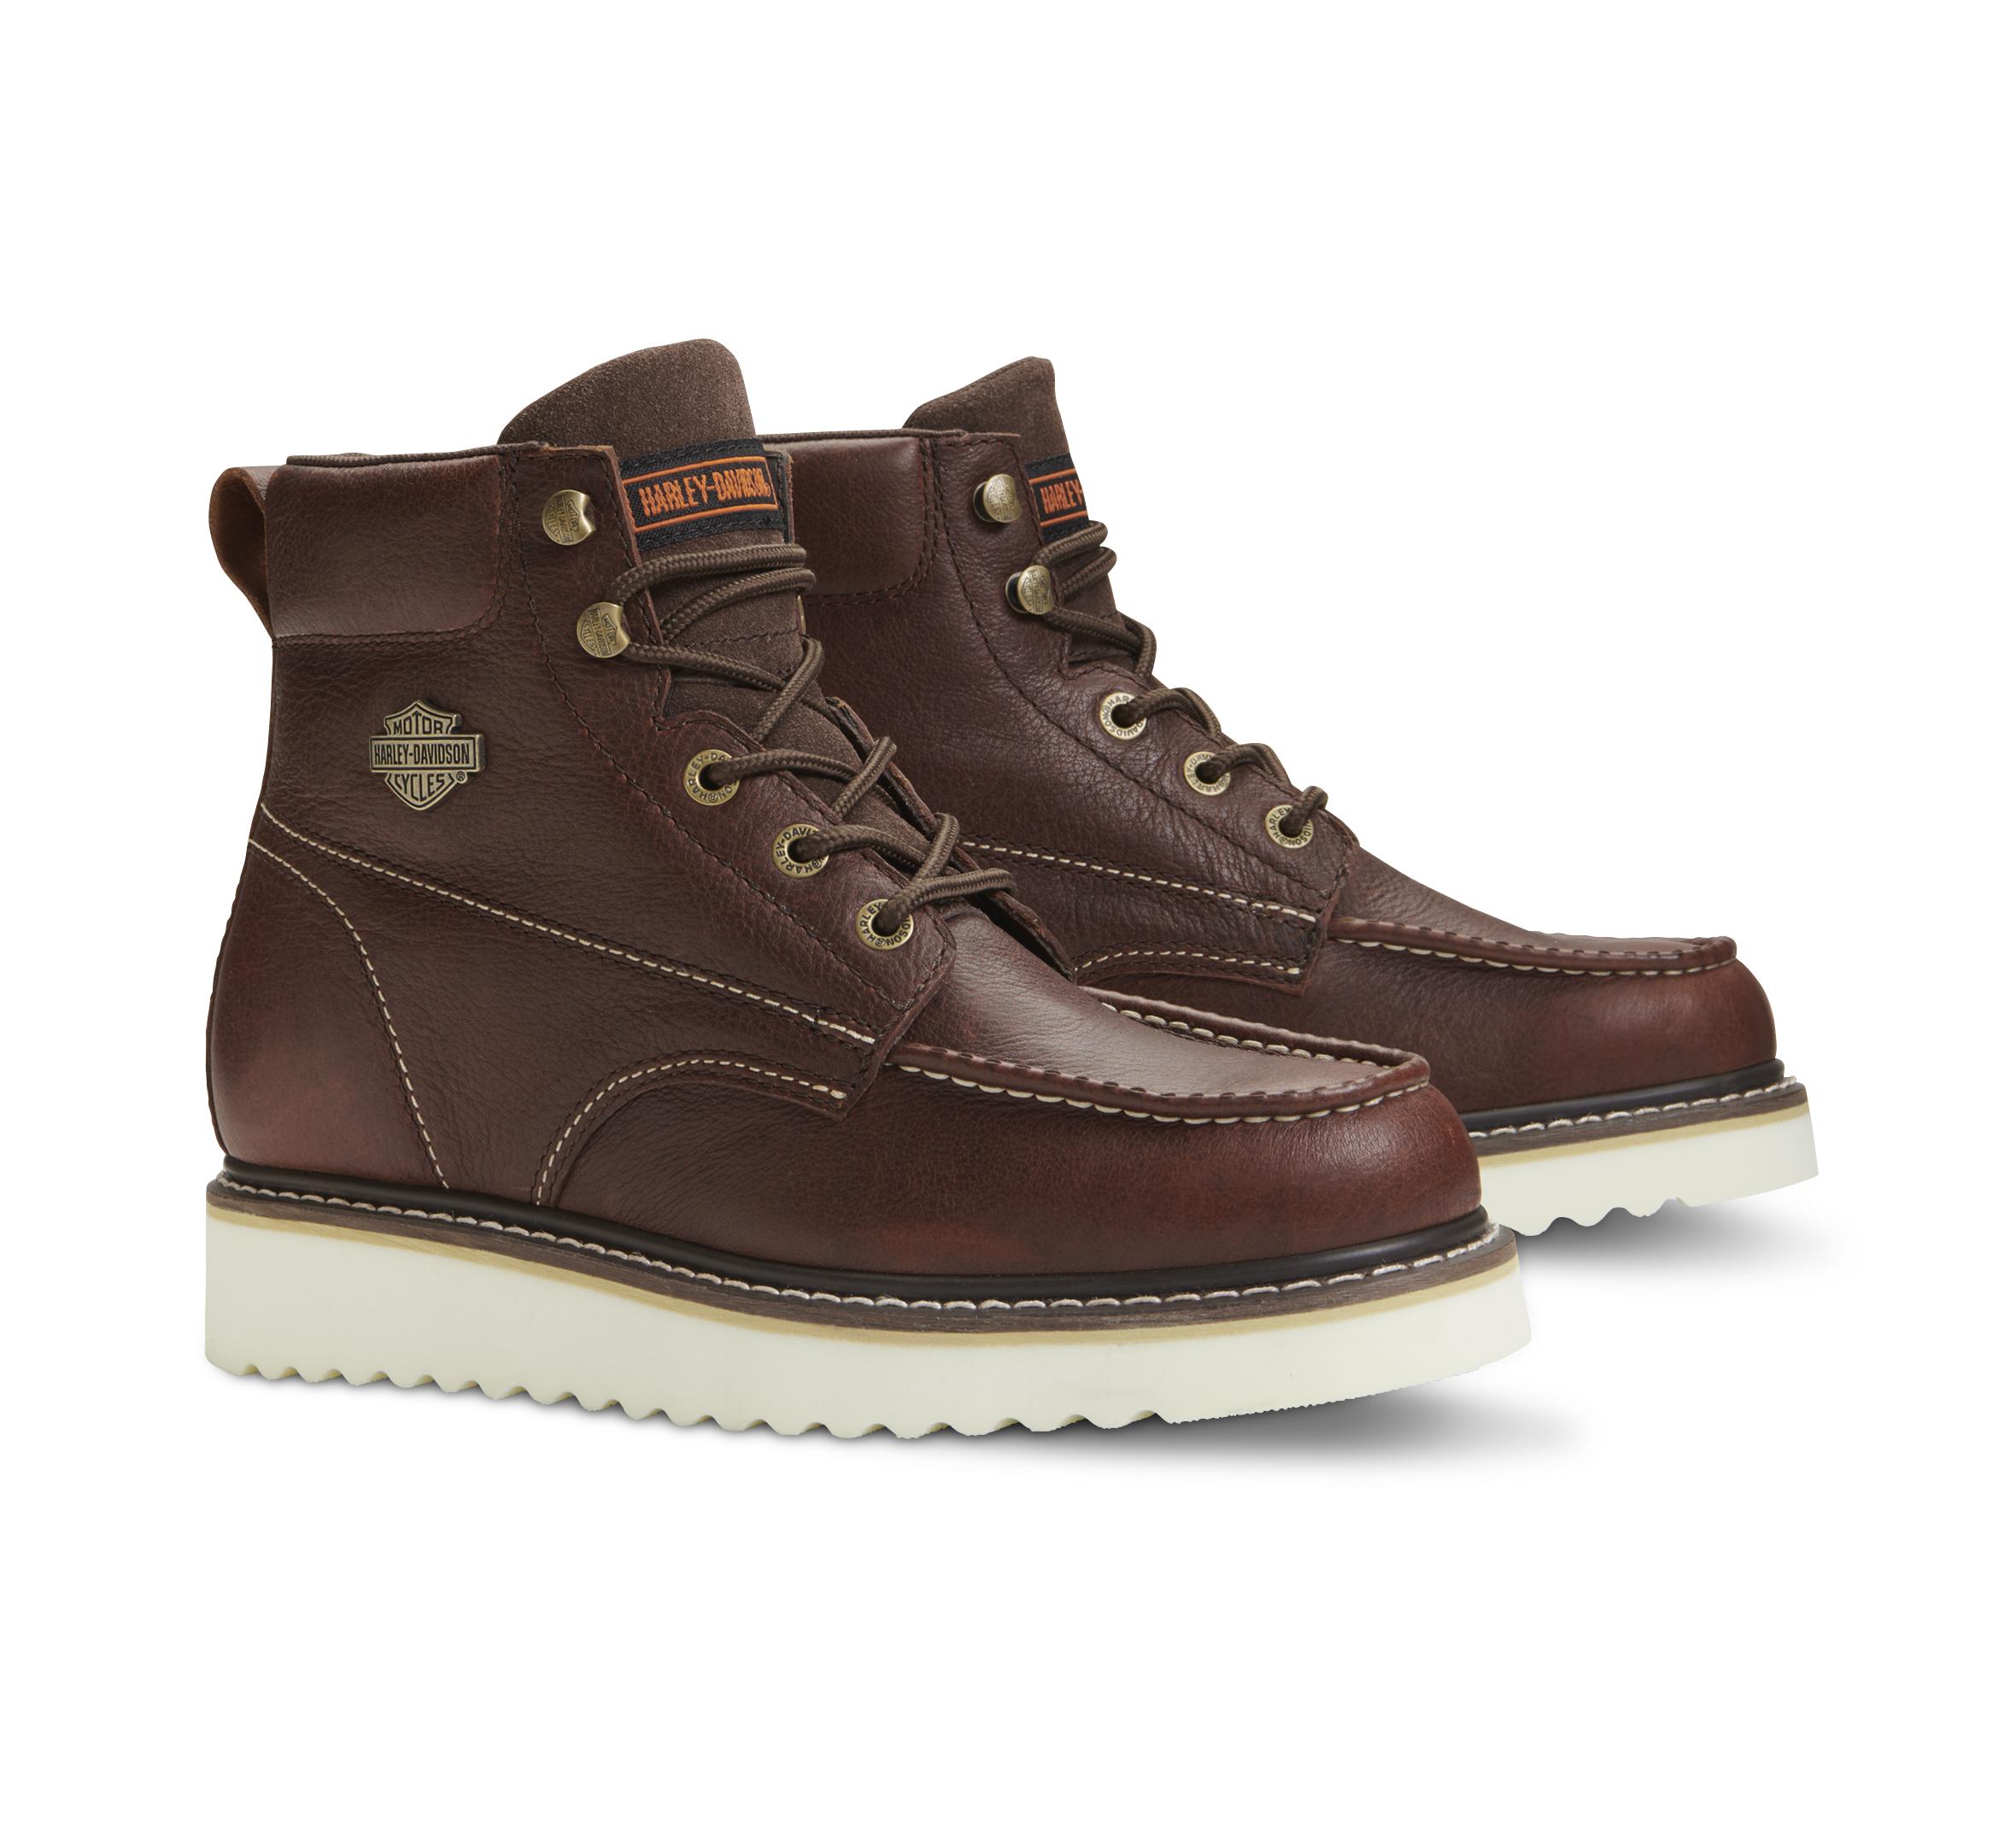 HARLEY-DAVIDSON FOOTWEAR Mens Palmerton Motorcycle Boot Brown 7